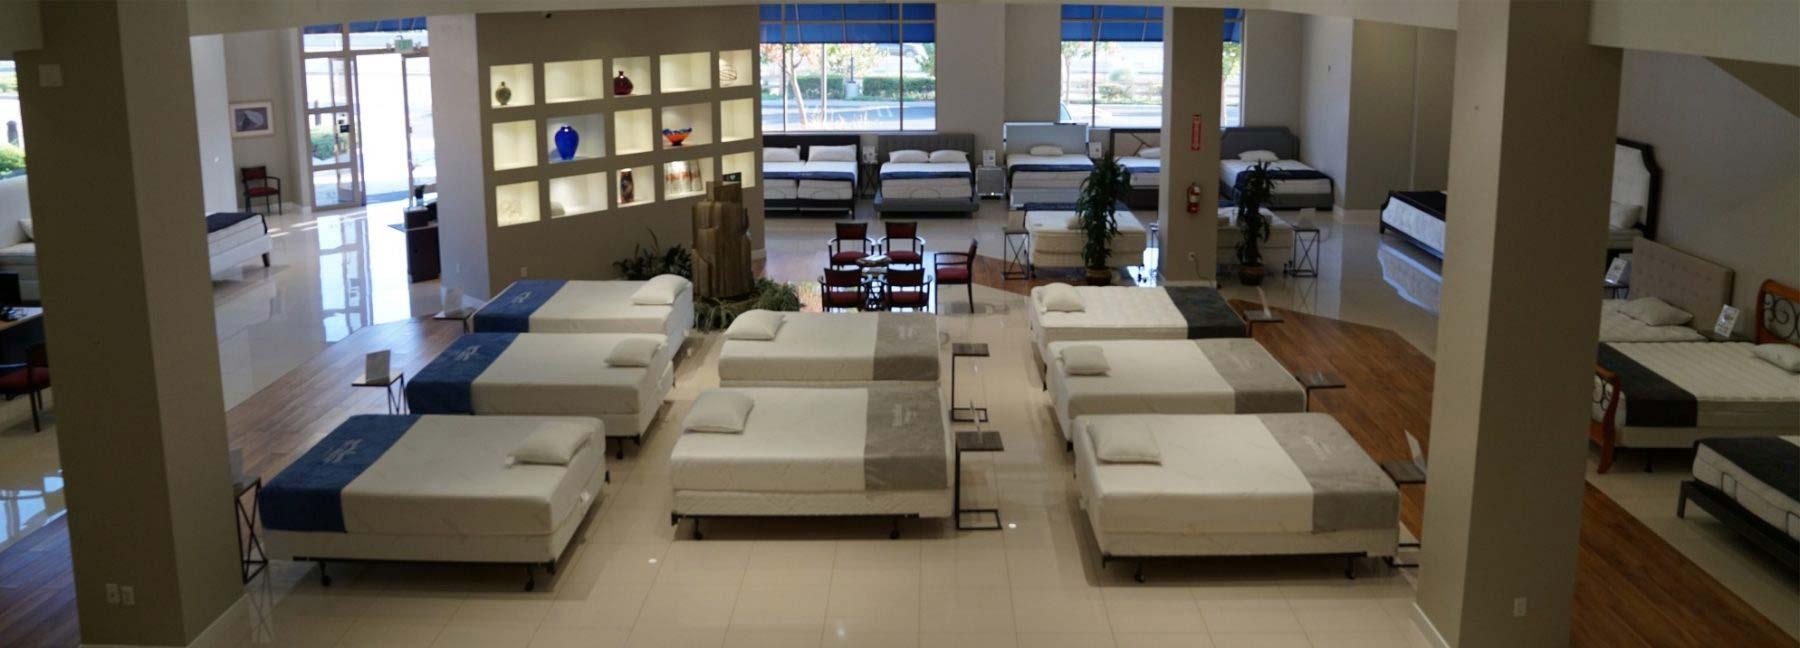 Mattress Store and Showroom | Factory Direct Savings ...